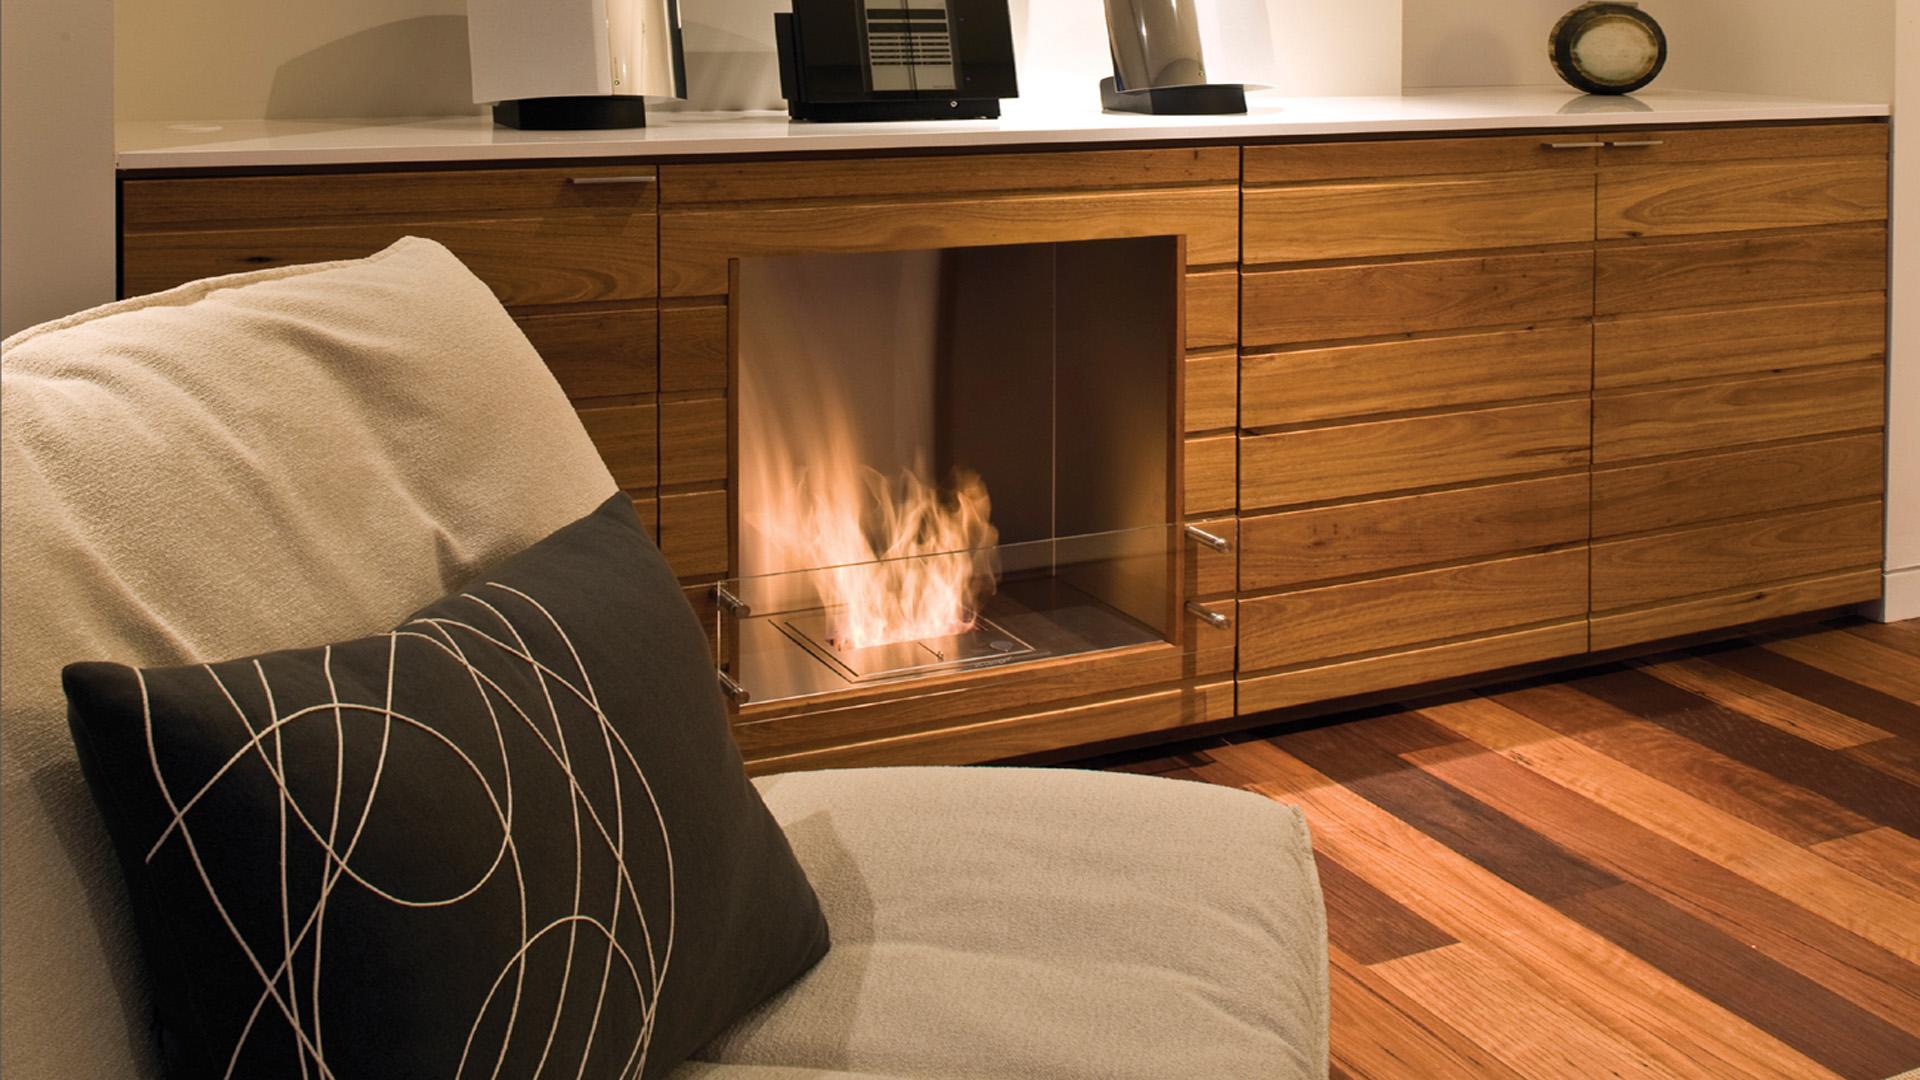 Ecosmartfire-FIREBOX 650SS